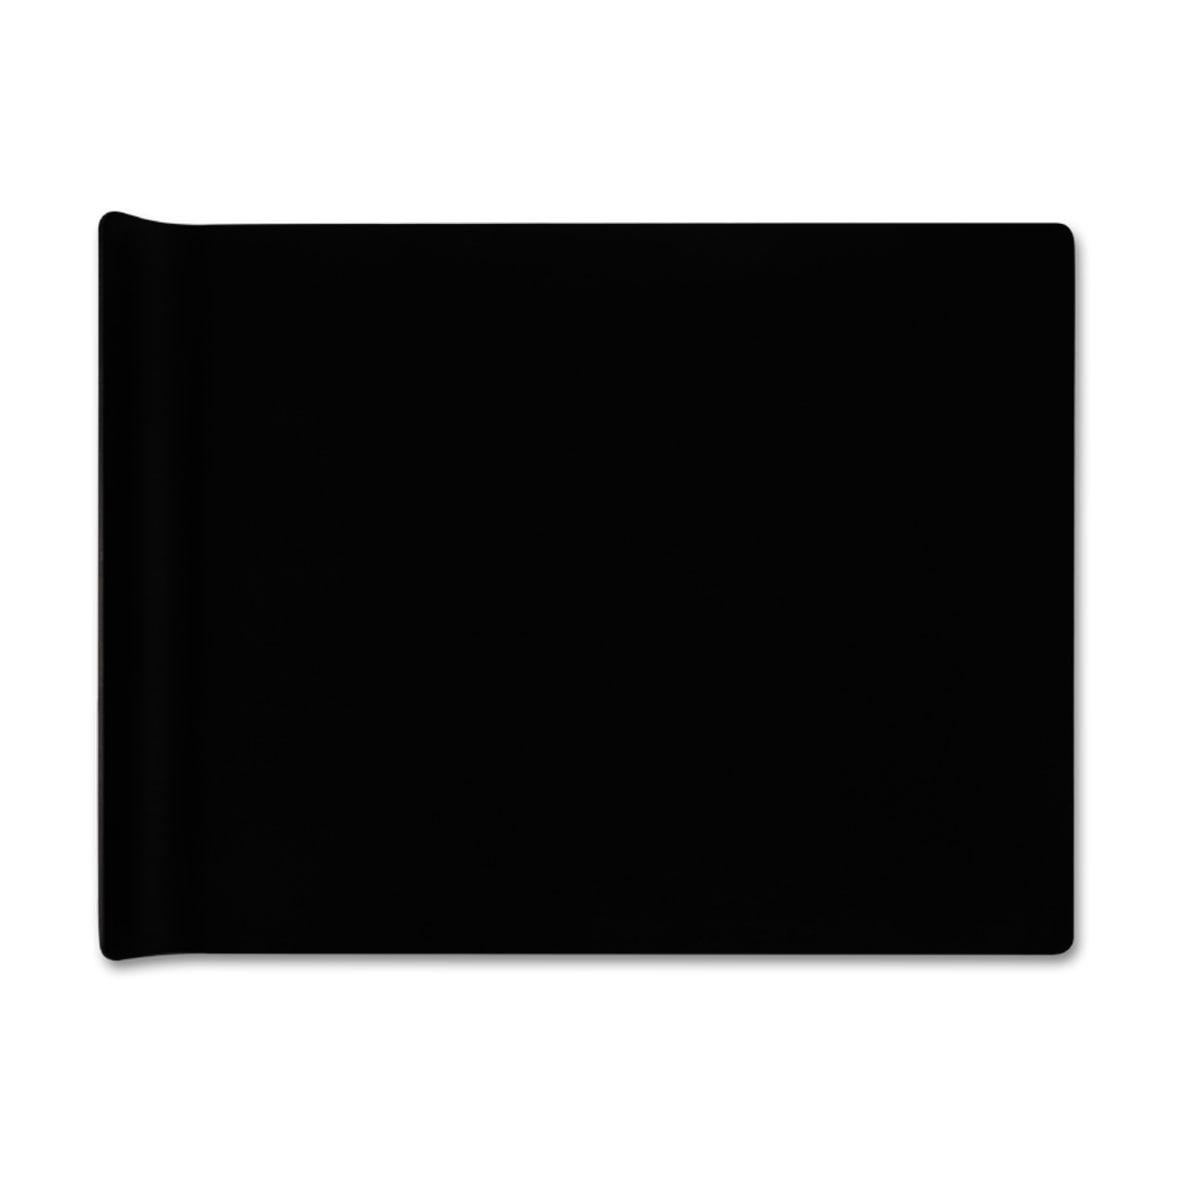 Table Arcos 693610 De Fiber De Cellulose And Resin Cutting 32x25 Cm Black Color In Box